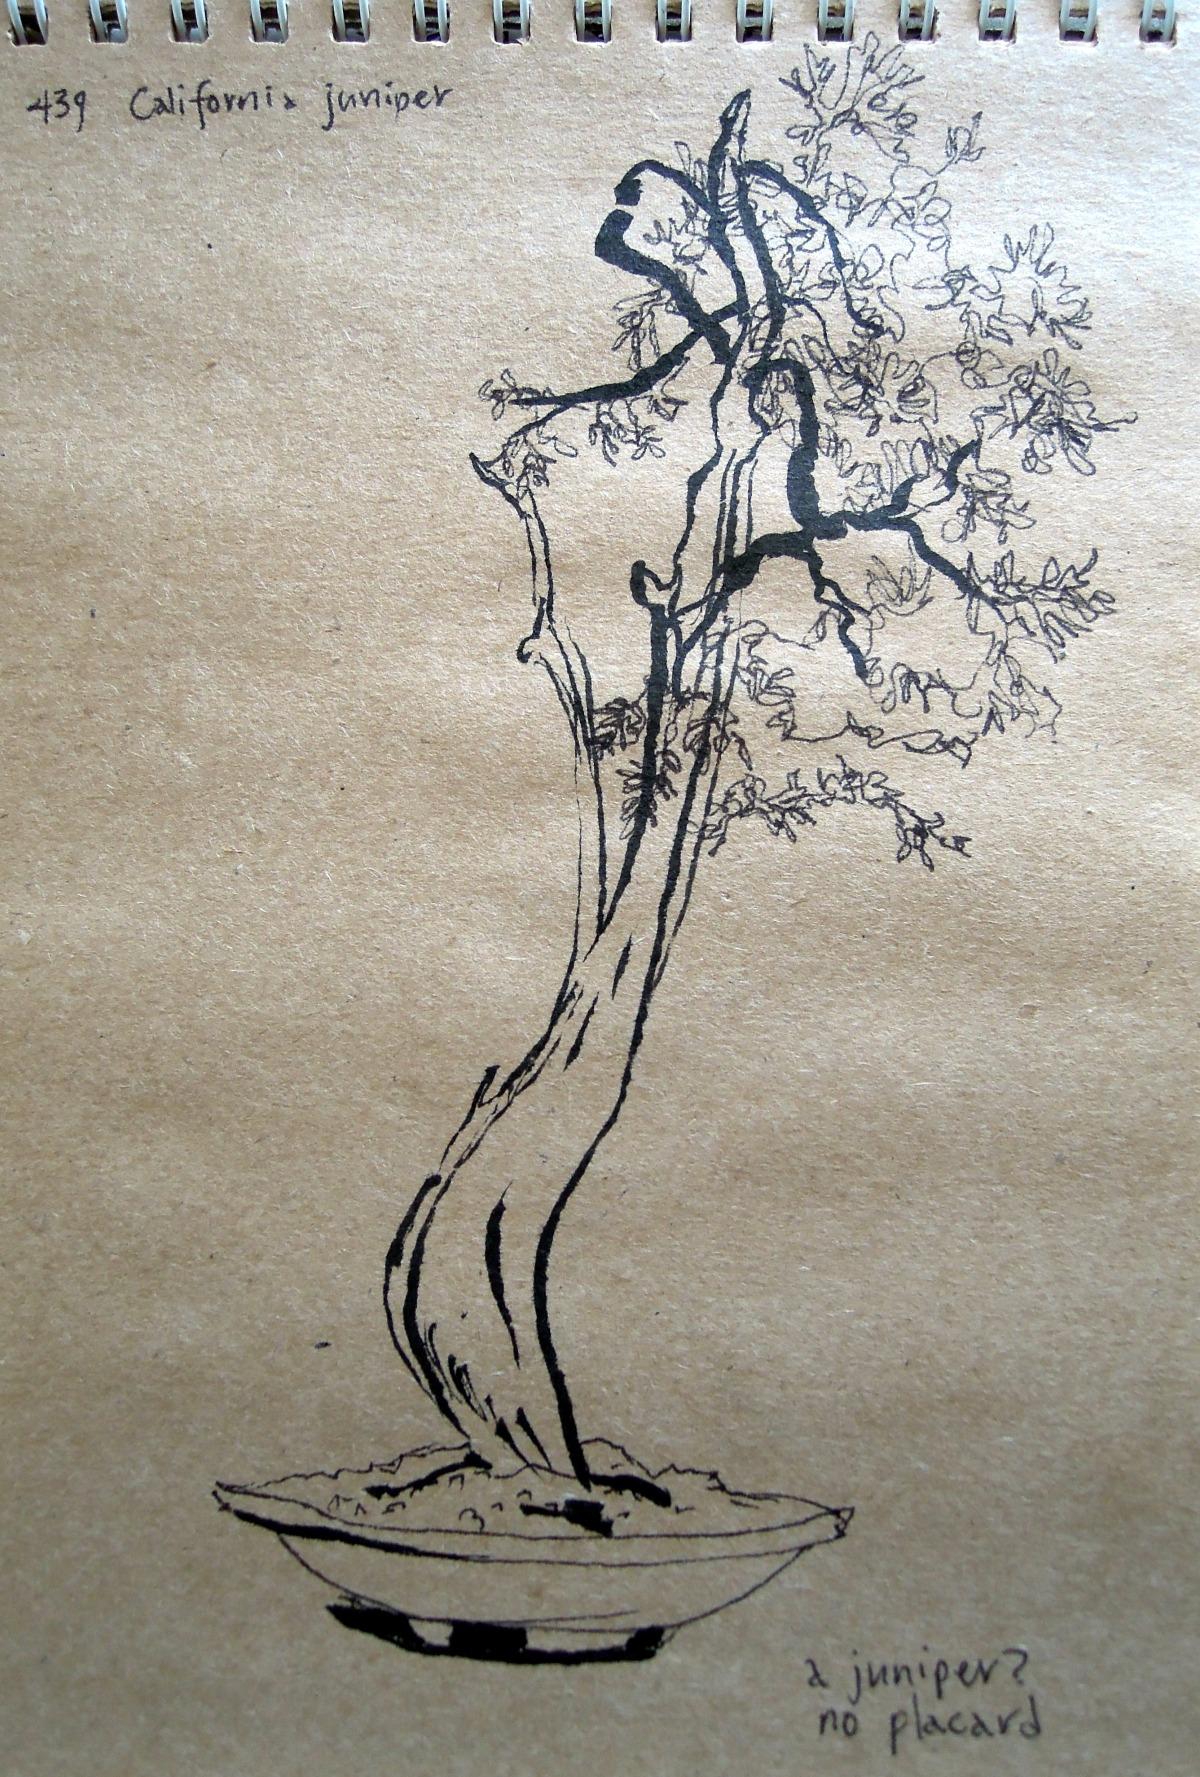 Sketch of California juniper at the Bonsai Garden of Lake Merritt, Oakland